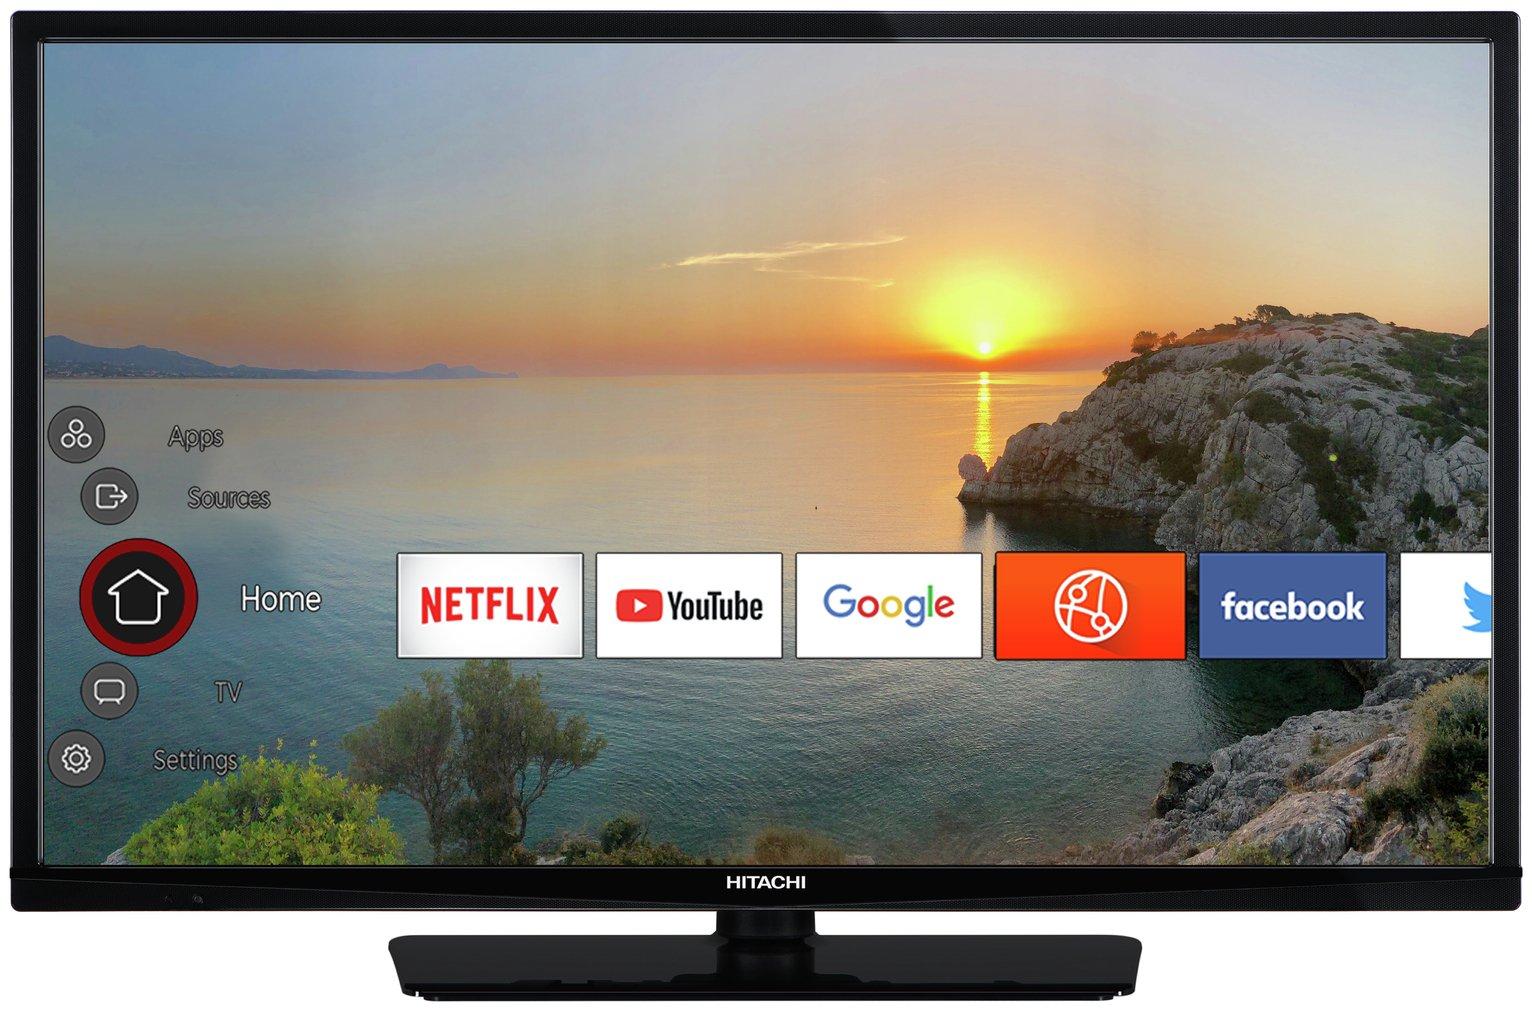 Hitachi 32 Inch 32HE2200U Smart HD Ready LED Freeview TV